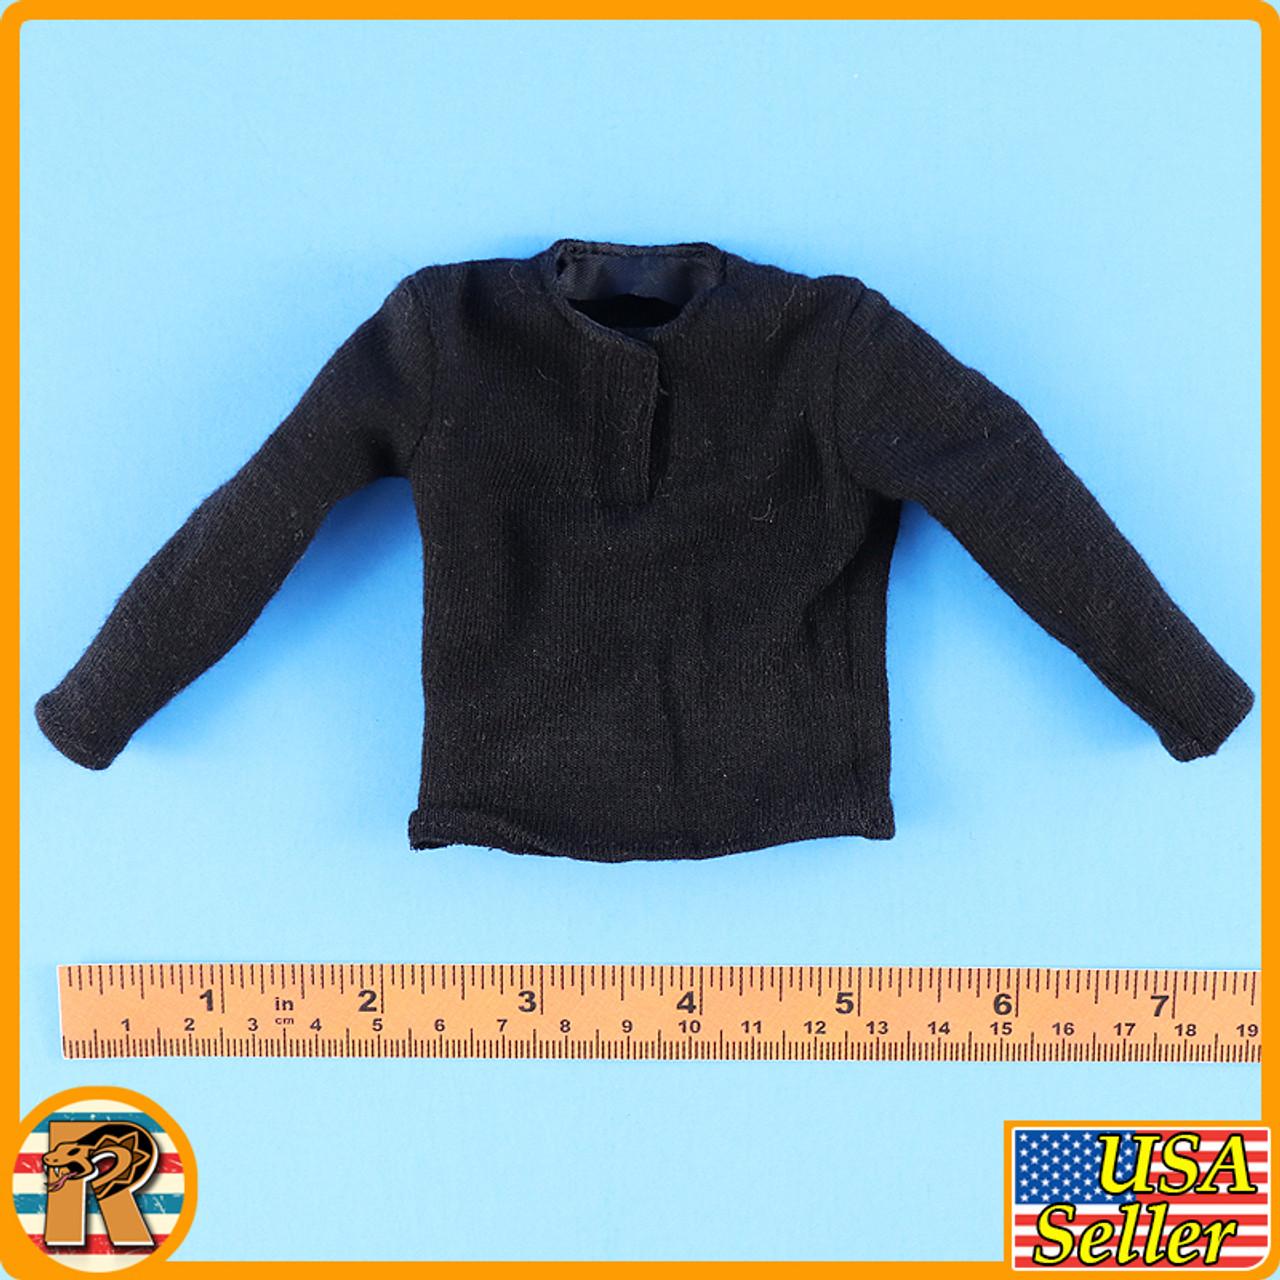 1938 Battle of Hailar - Black Long Sleeve Shirt - 1/6 Scale -